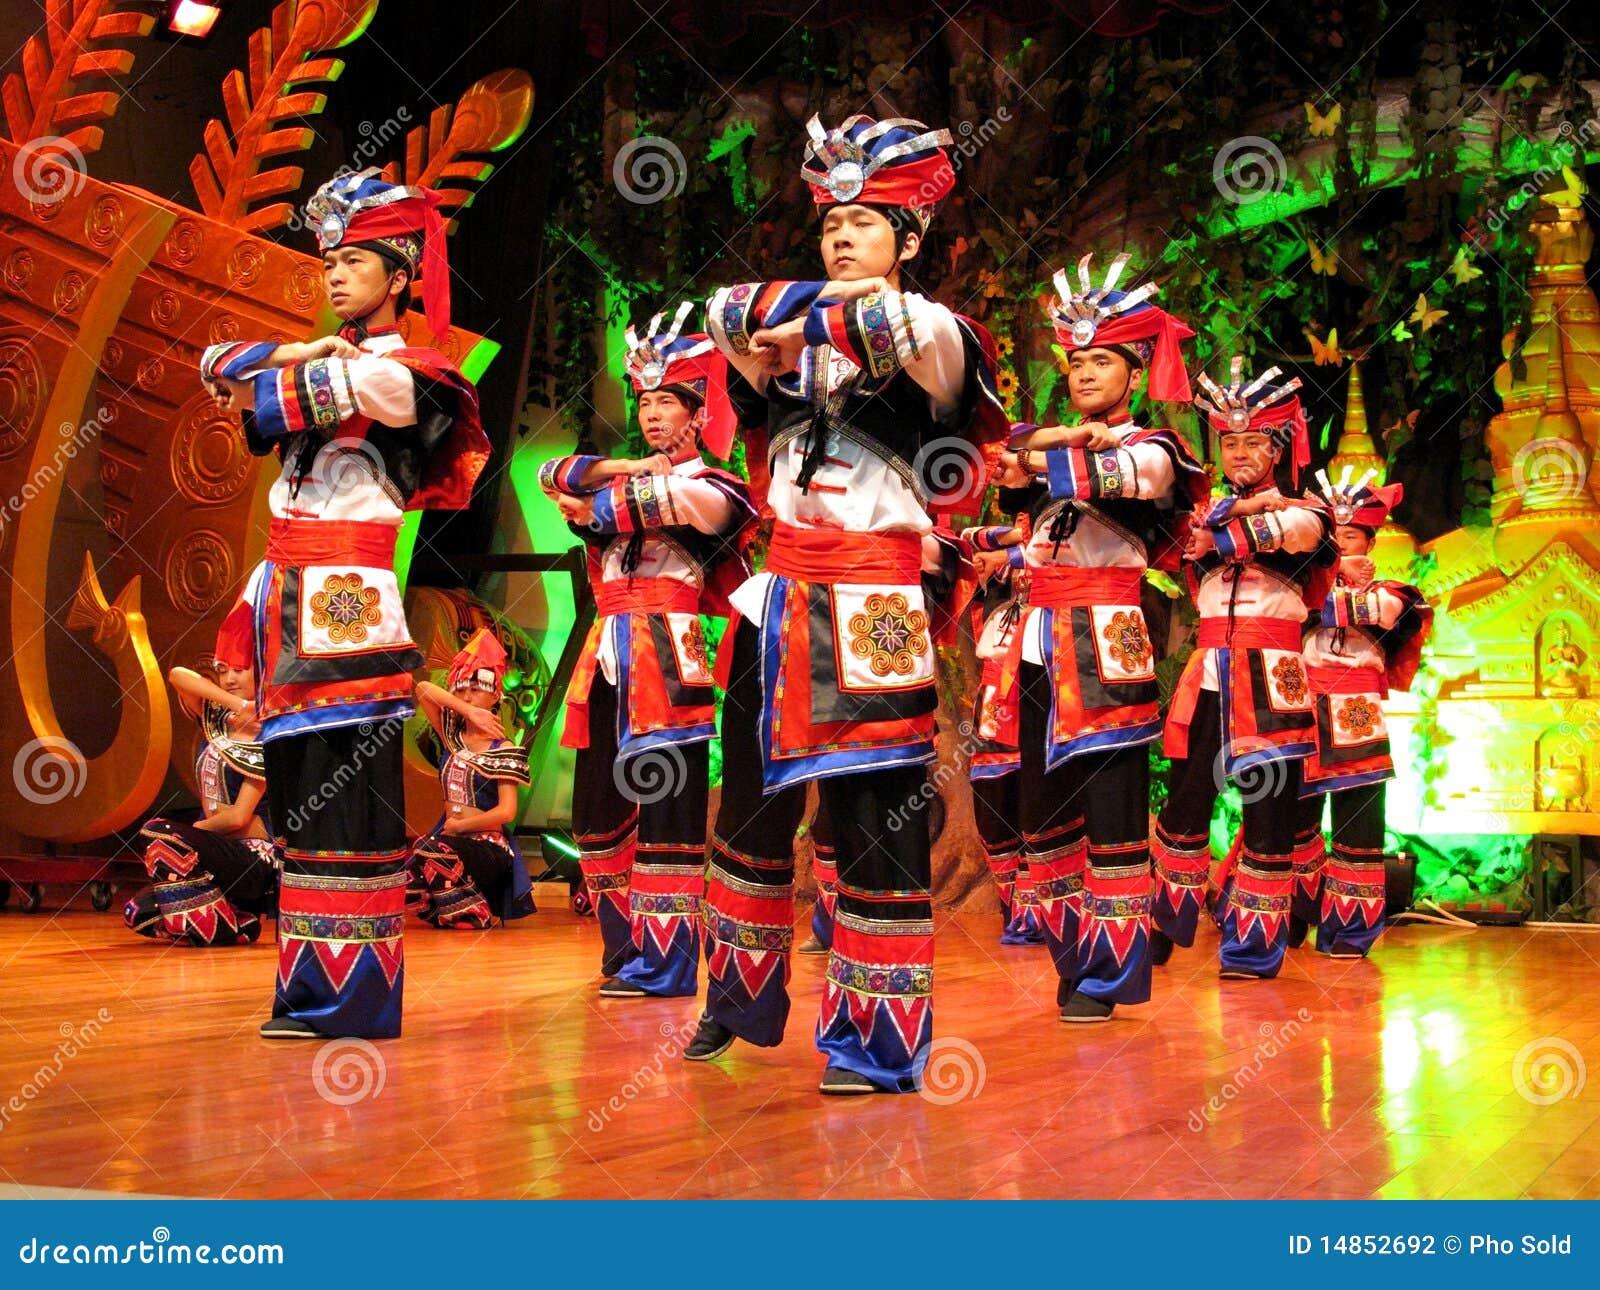 Minority Man in Colourful Yunnan